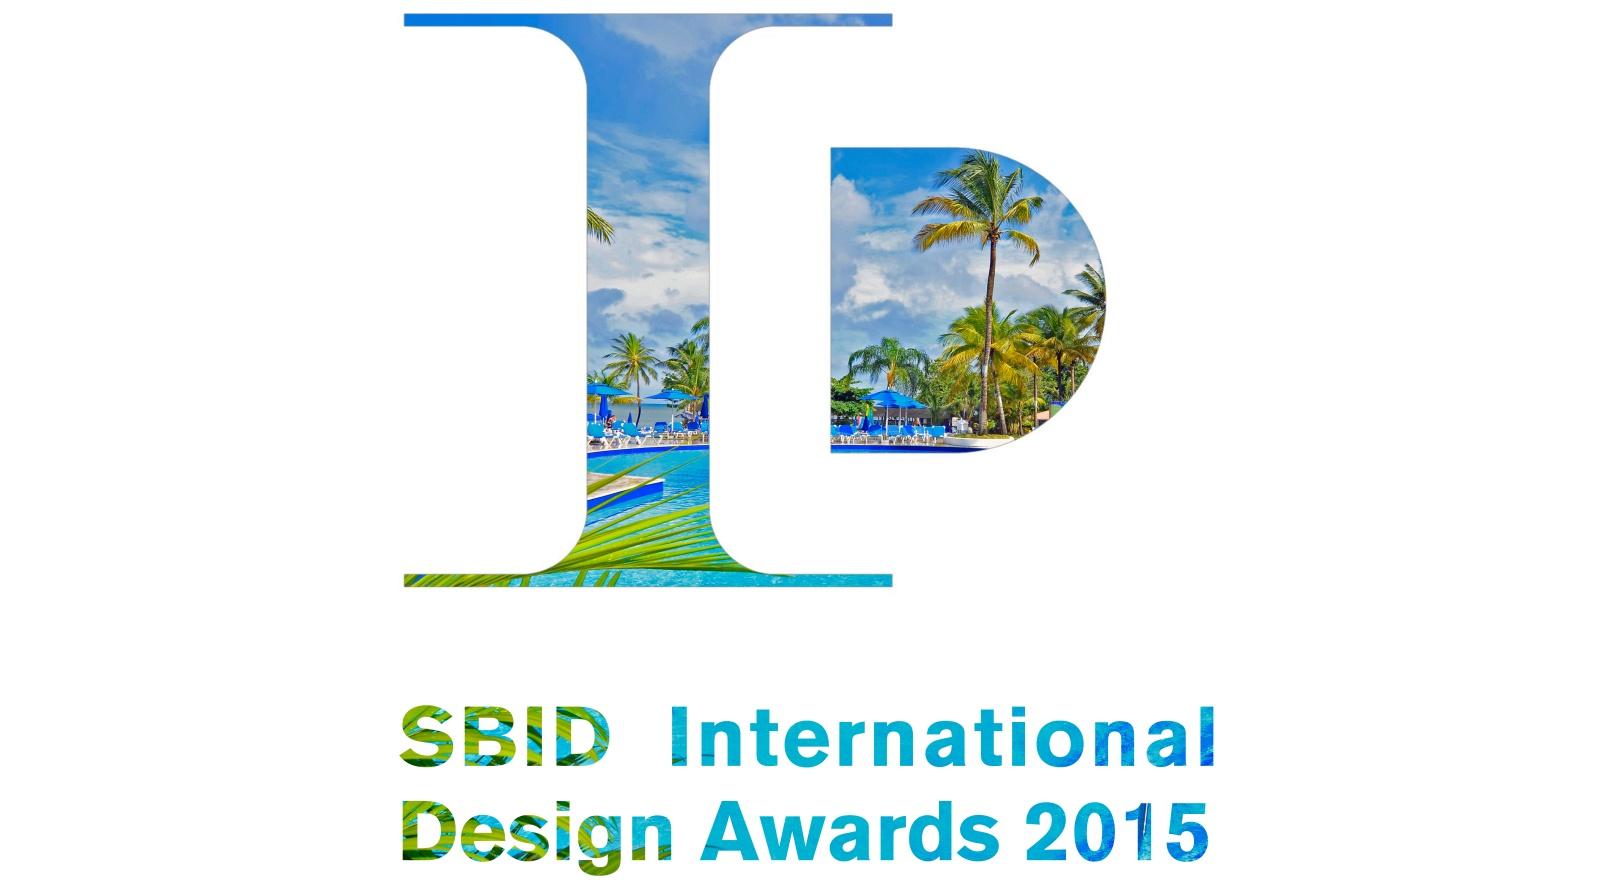 SBID Awards 2015